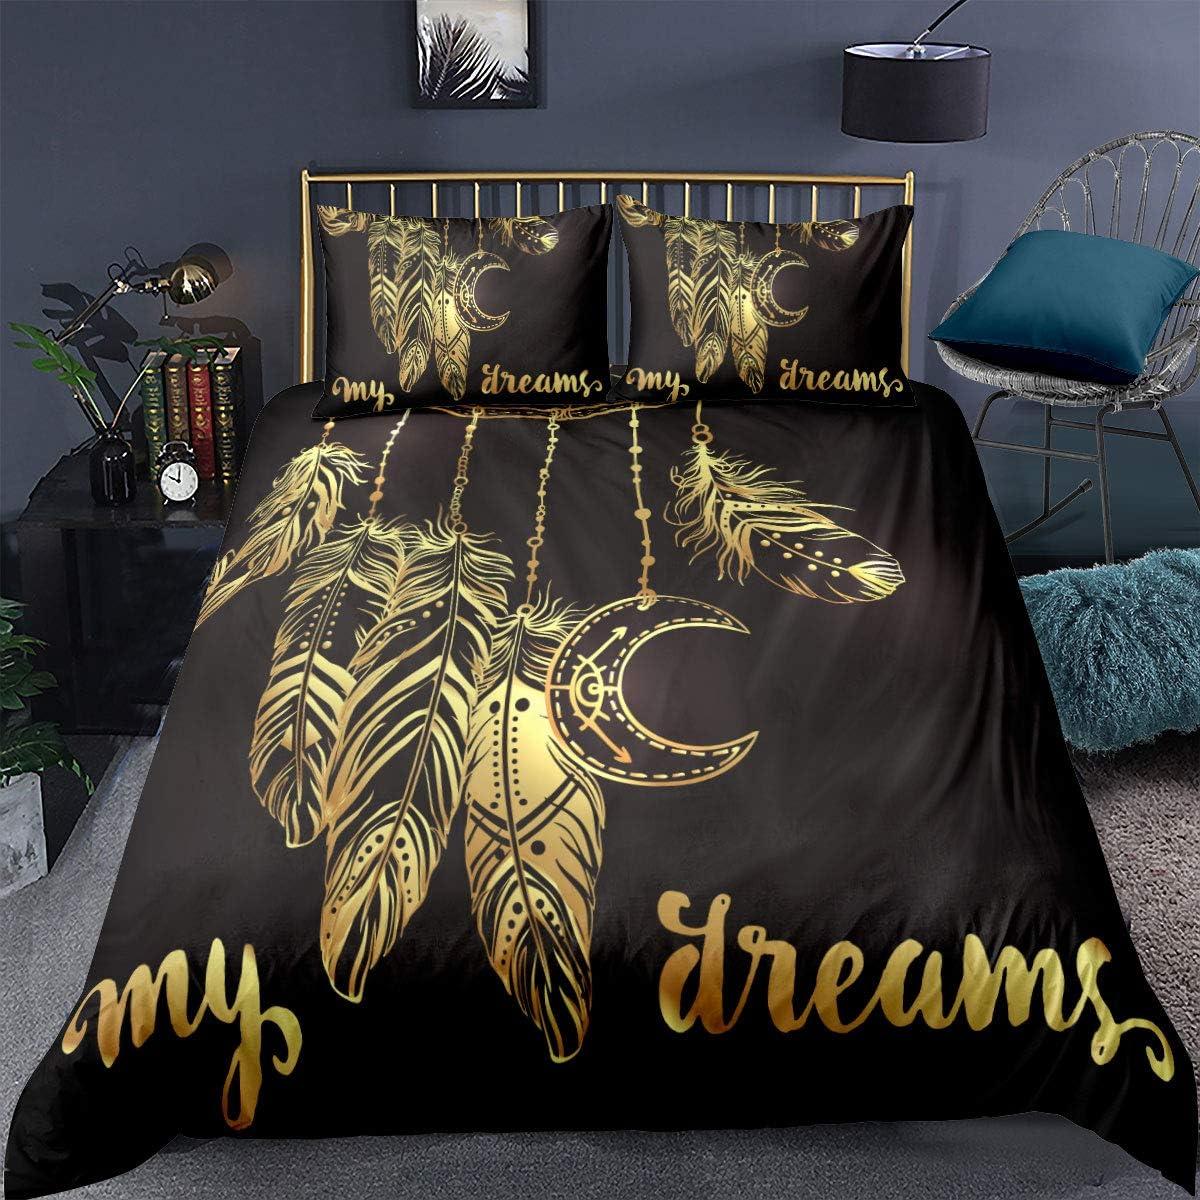 Feelyou Directly managed store Dream discount Catcher Bedding Dreamcatcher Comforter Boho Print